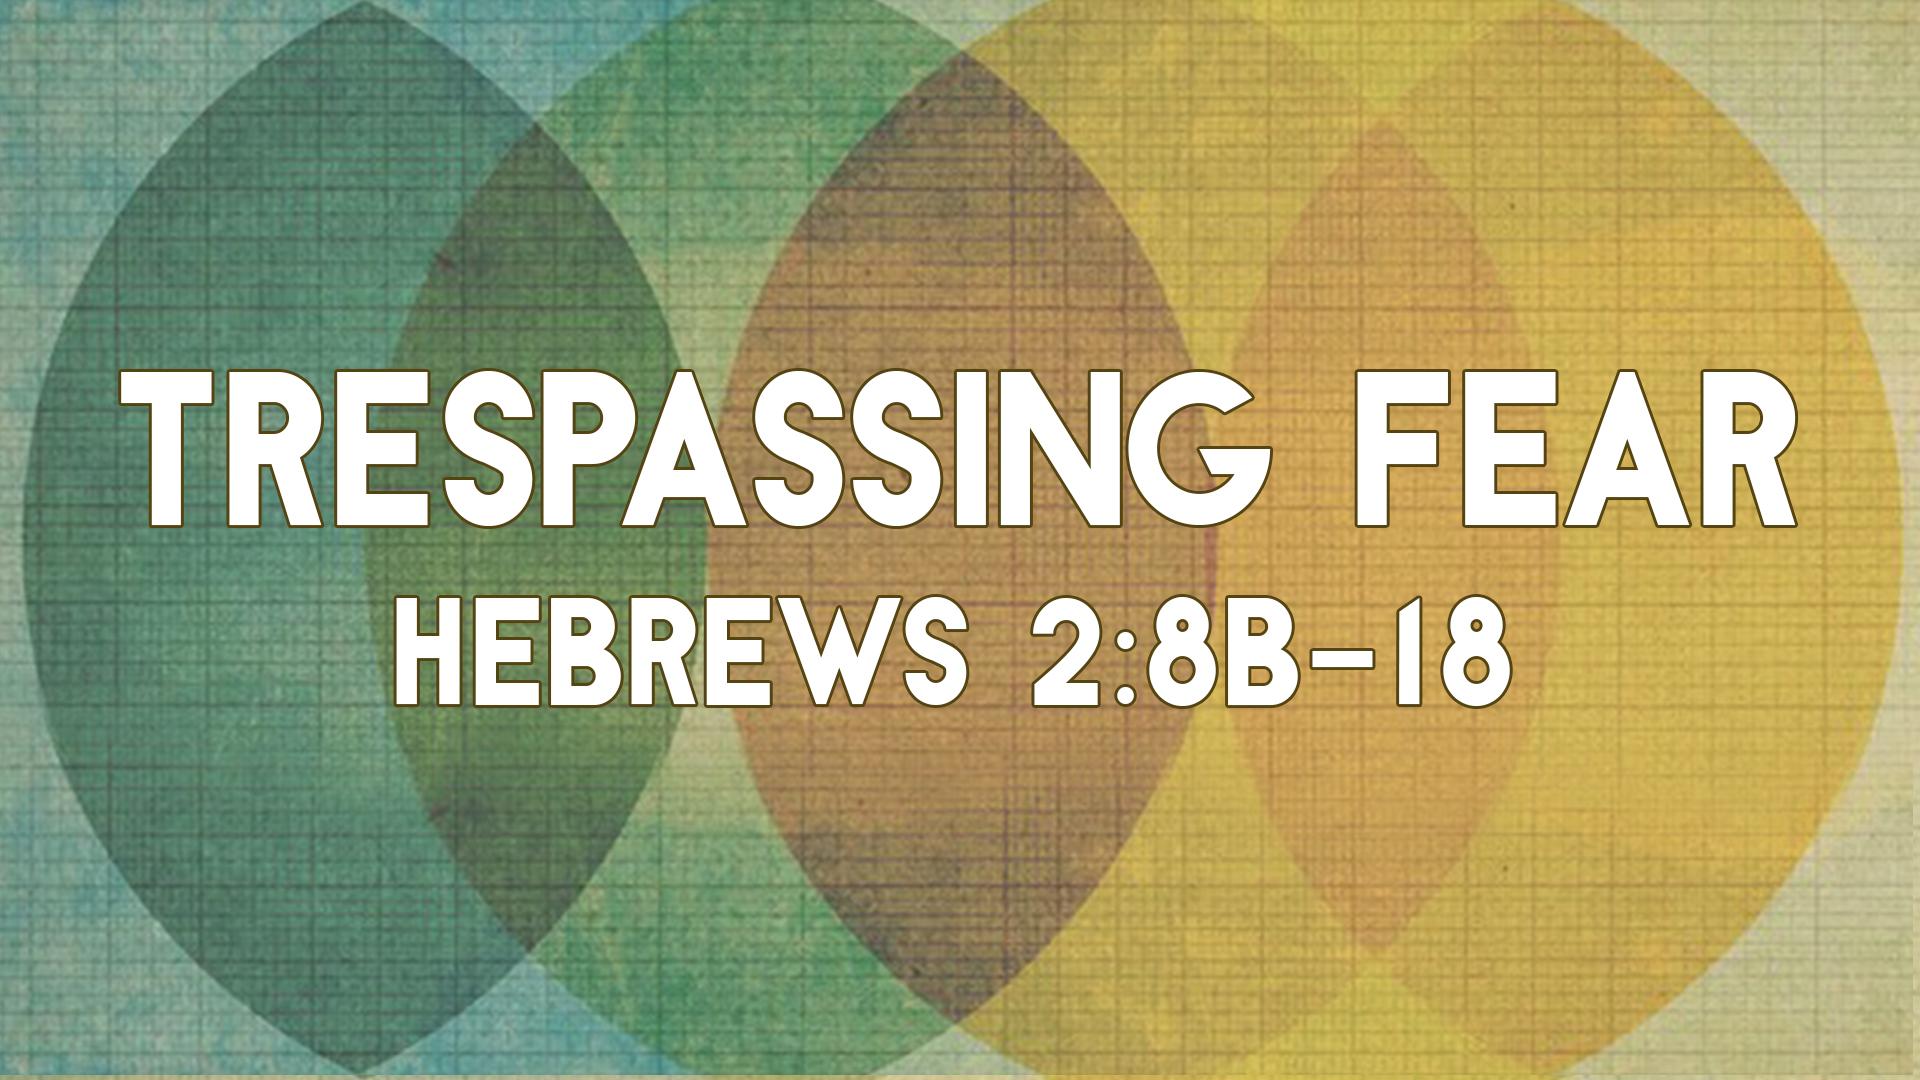 2016.07.10_TrespassingFearTitle.jpg